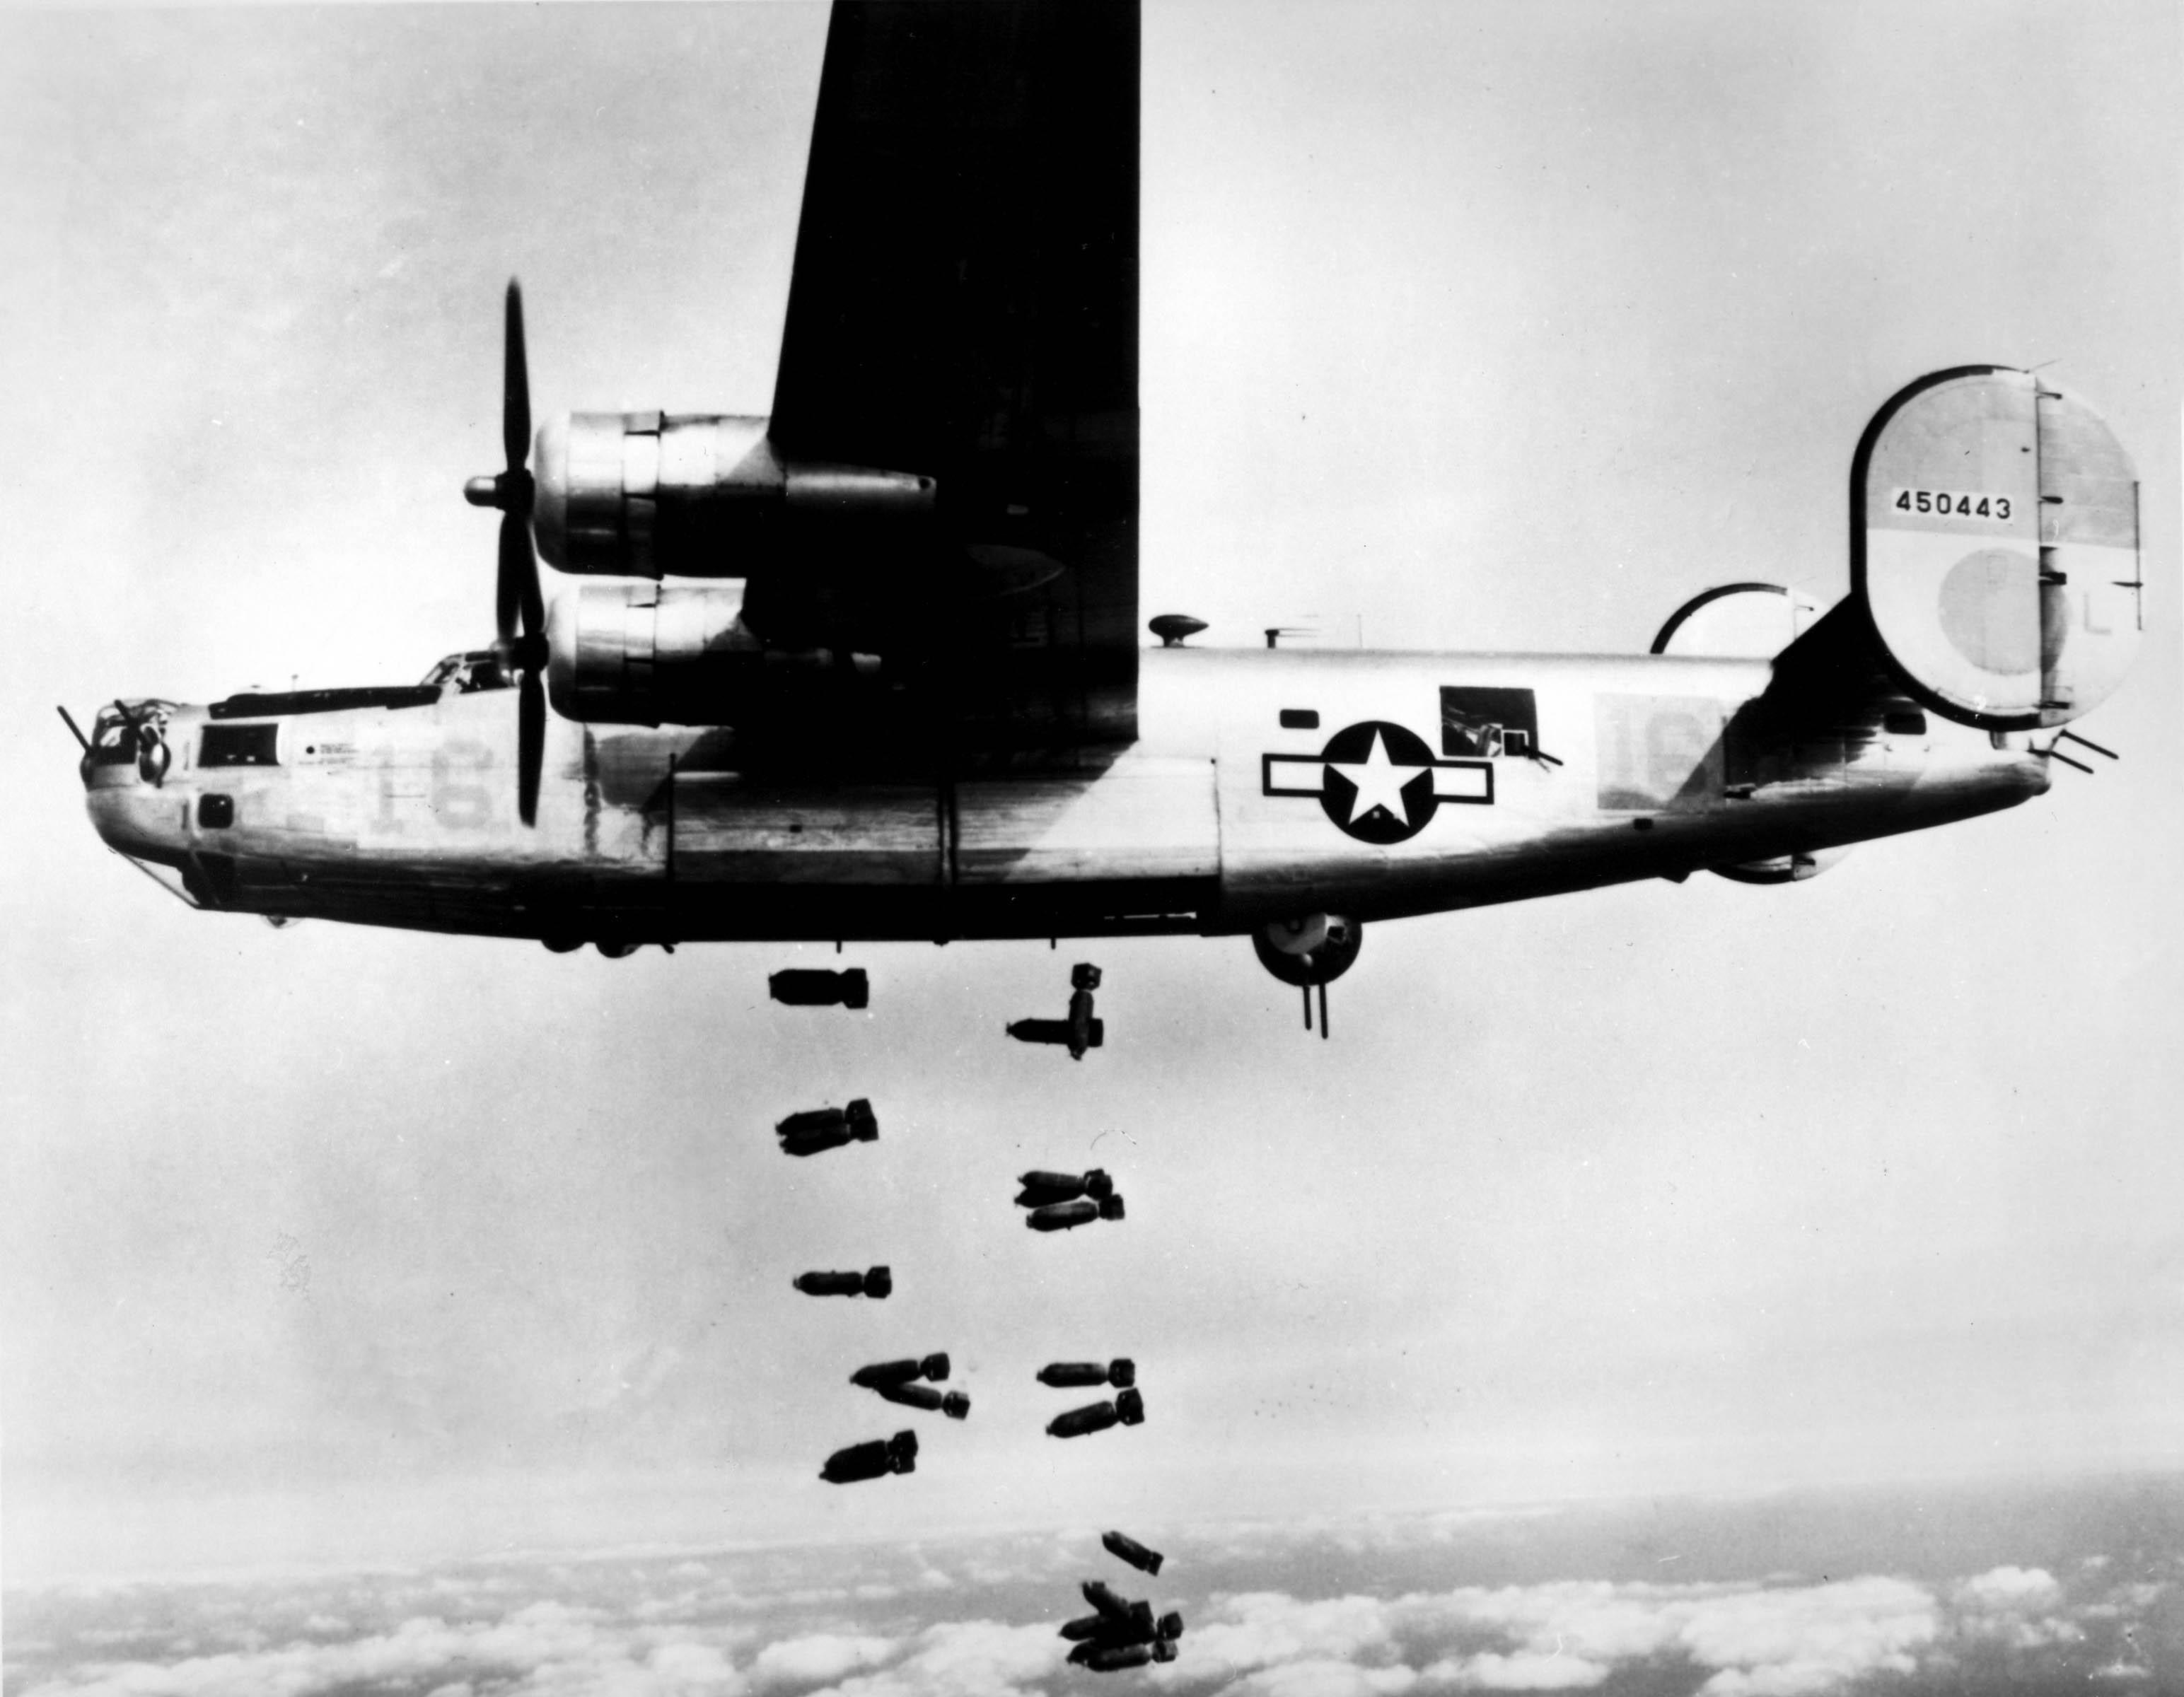 File:15th AF B-24 Liberator.jpg - Wikimedia Commons